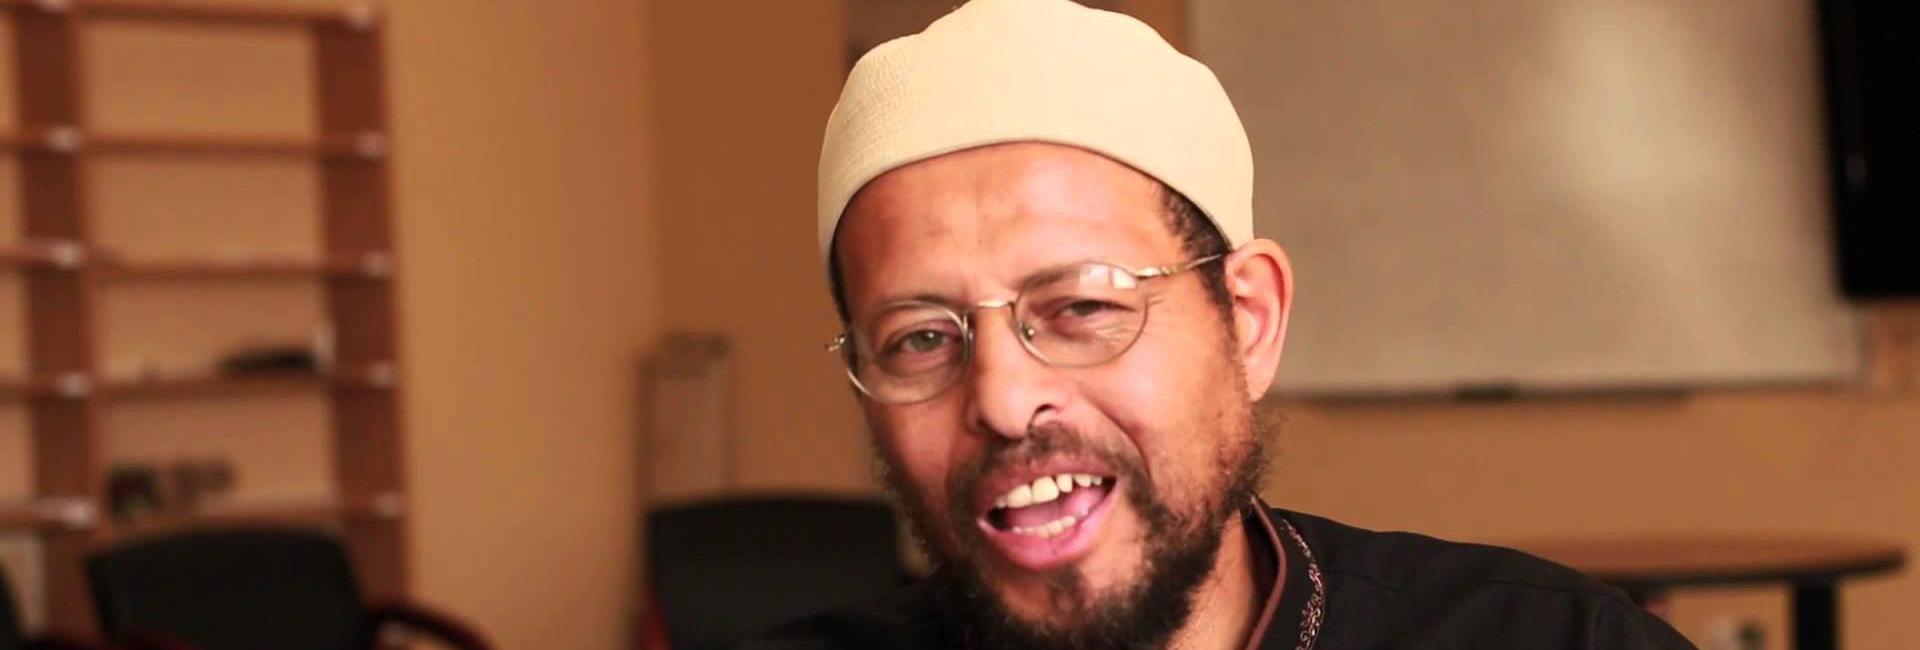 How Do We Fight Shaytan? By Getting Married – Imam Zaid Shakir